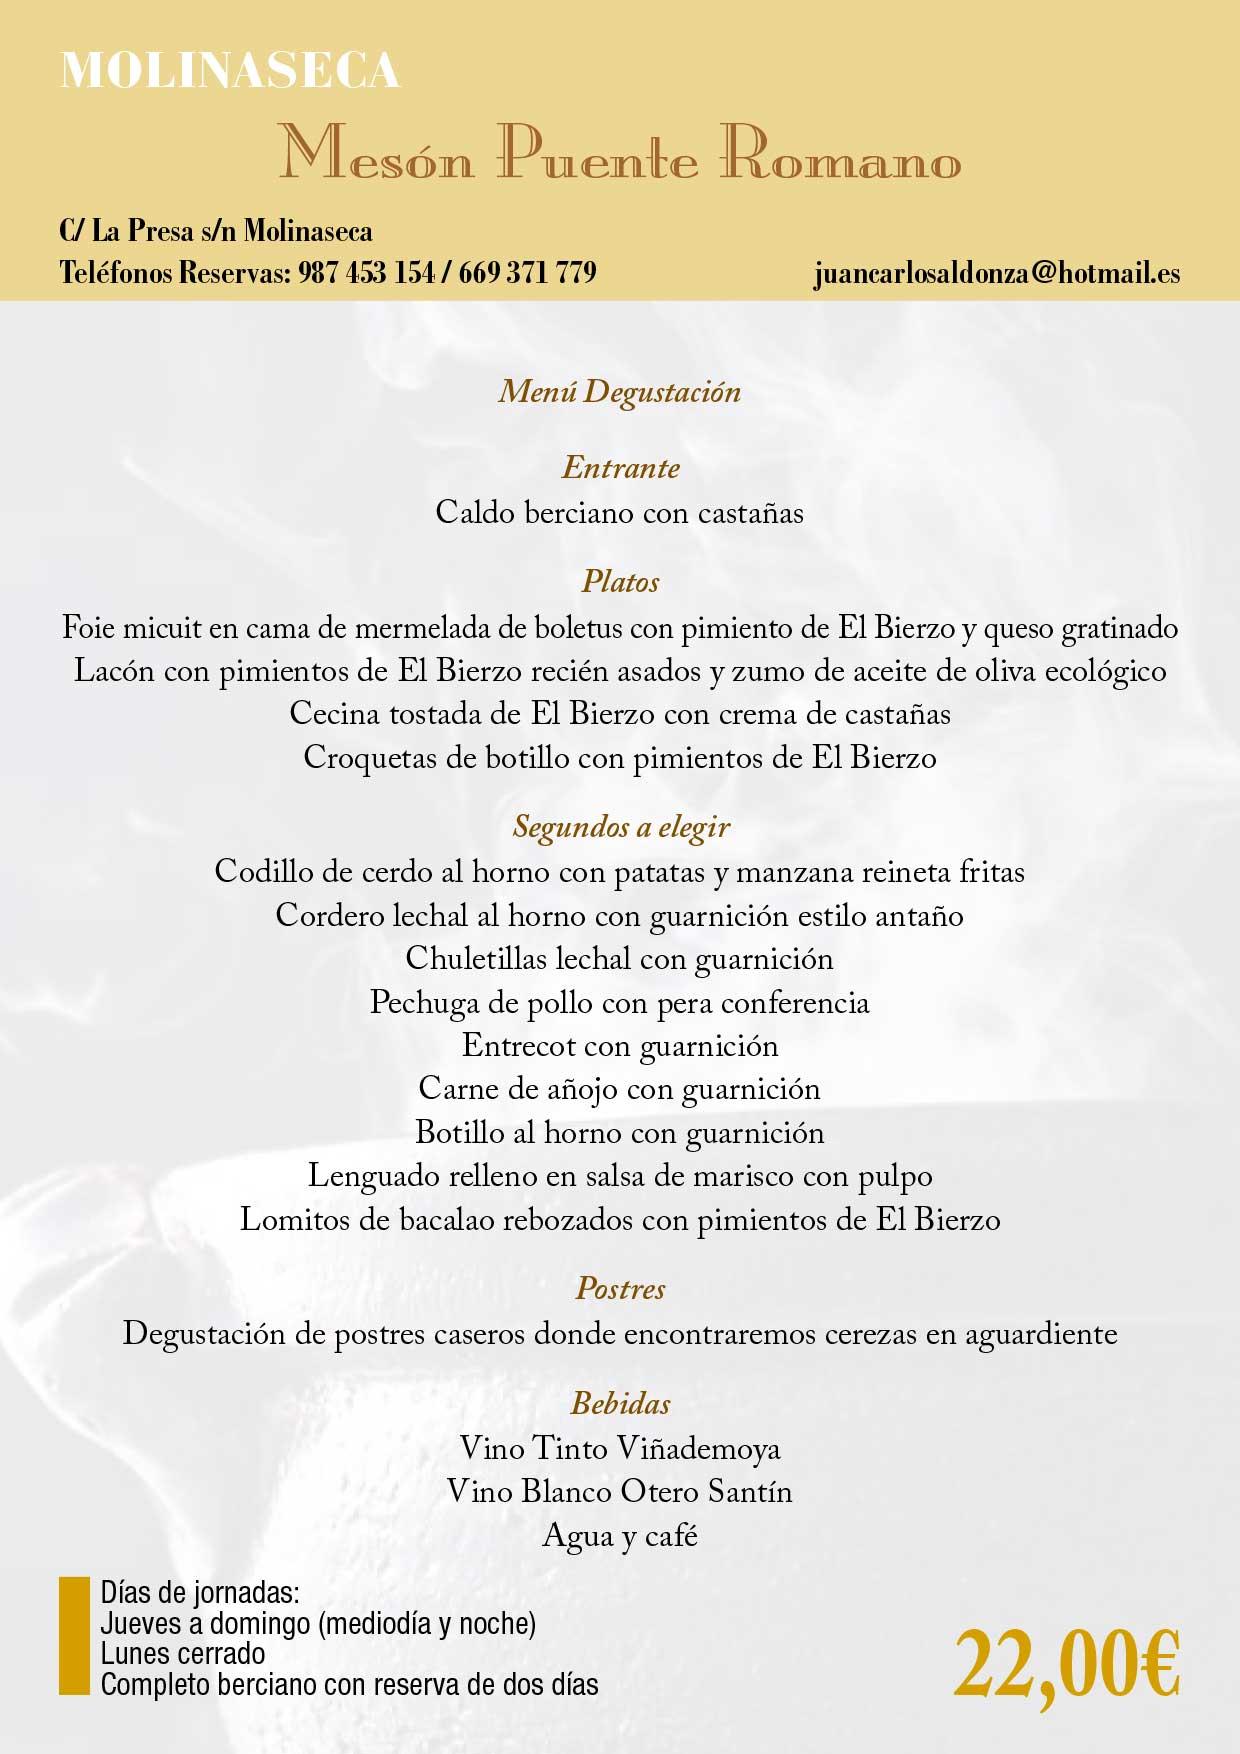 XXXIII Jornadas gastronómicas del Bierzo 2017. Restaurantes participantes 42